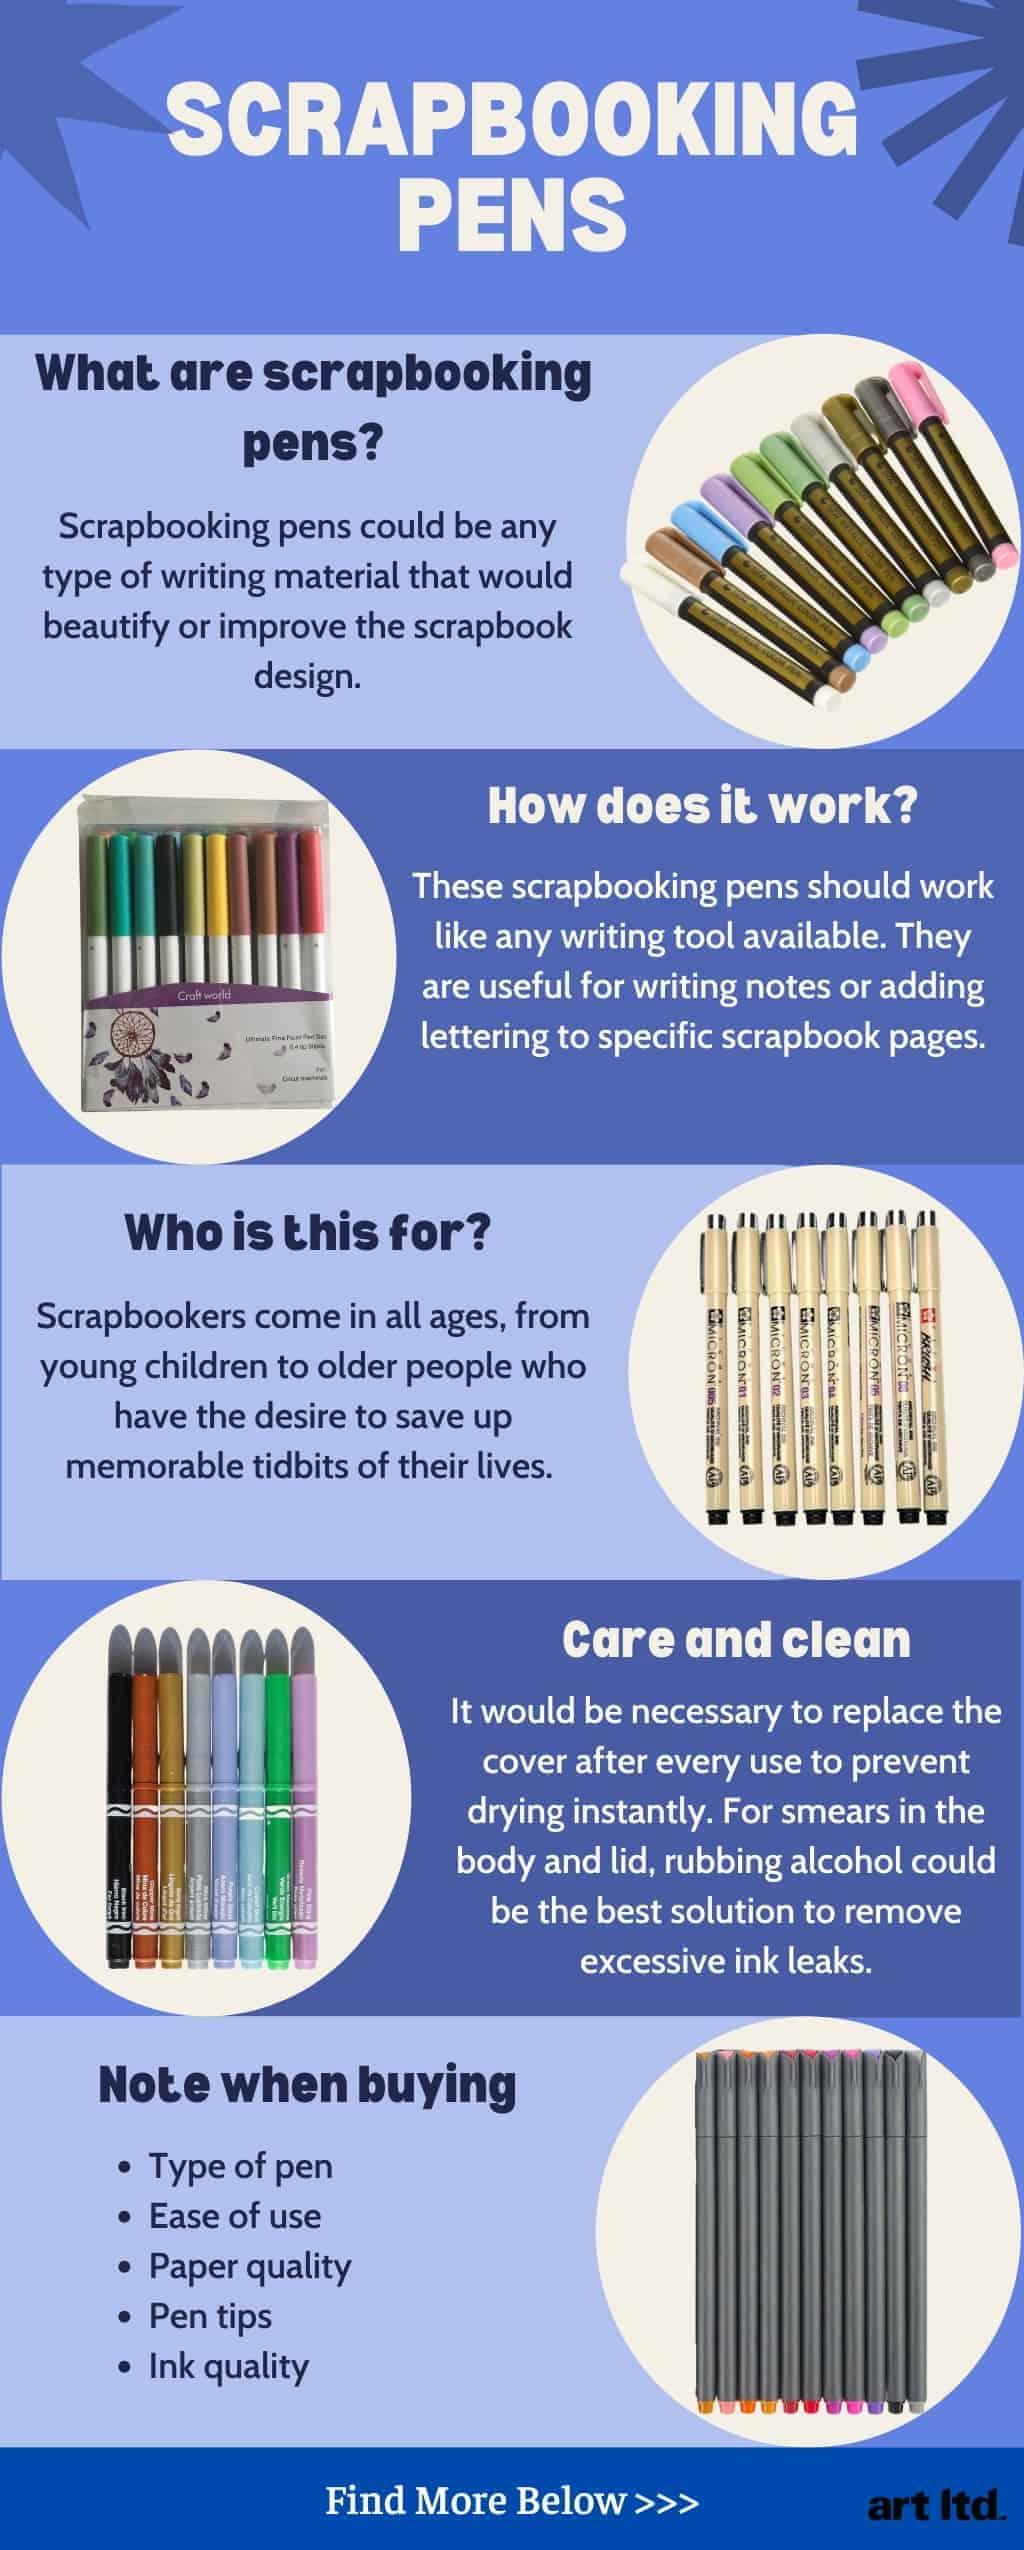 acid-free-pens-for-scrapbooking